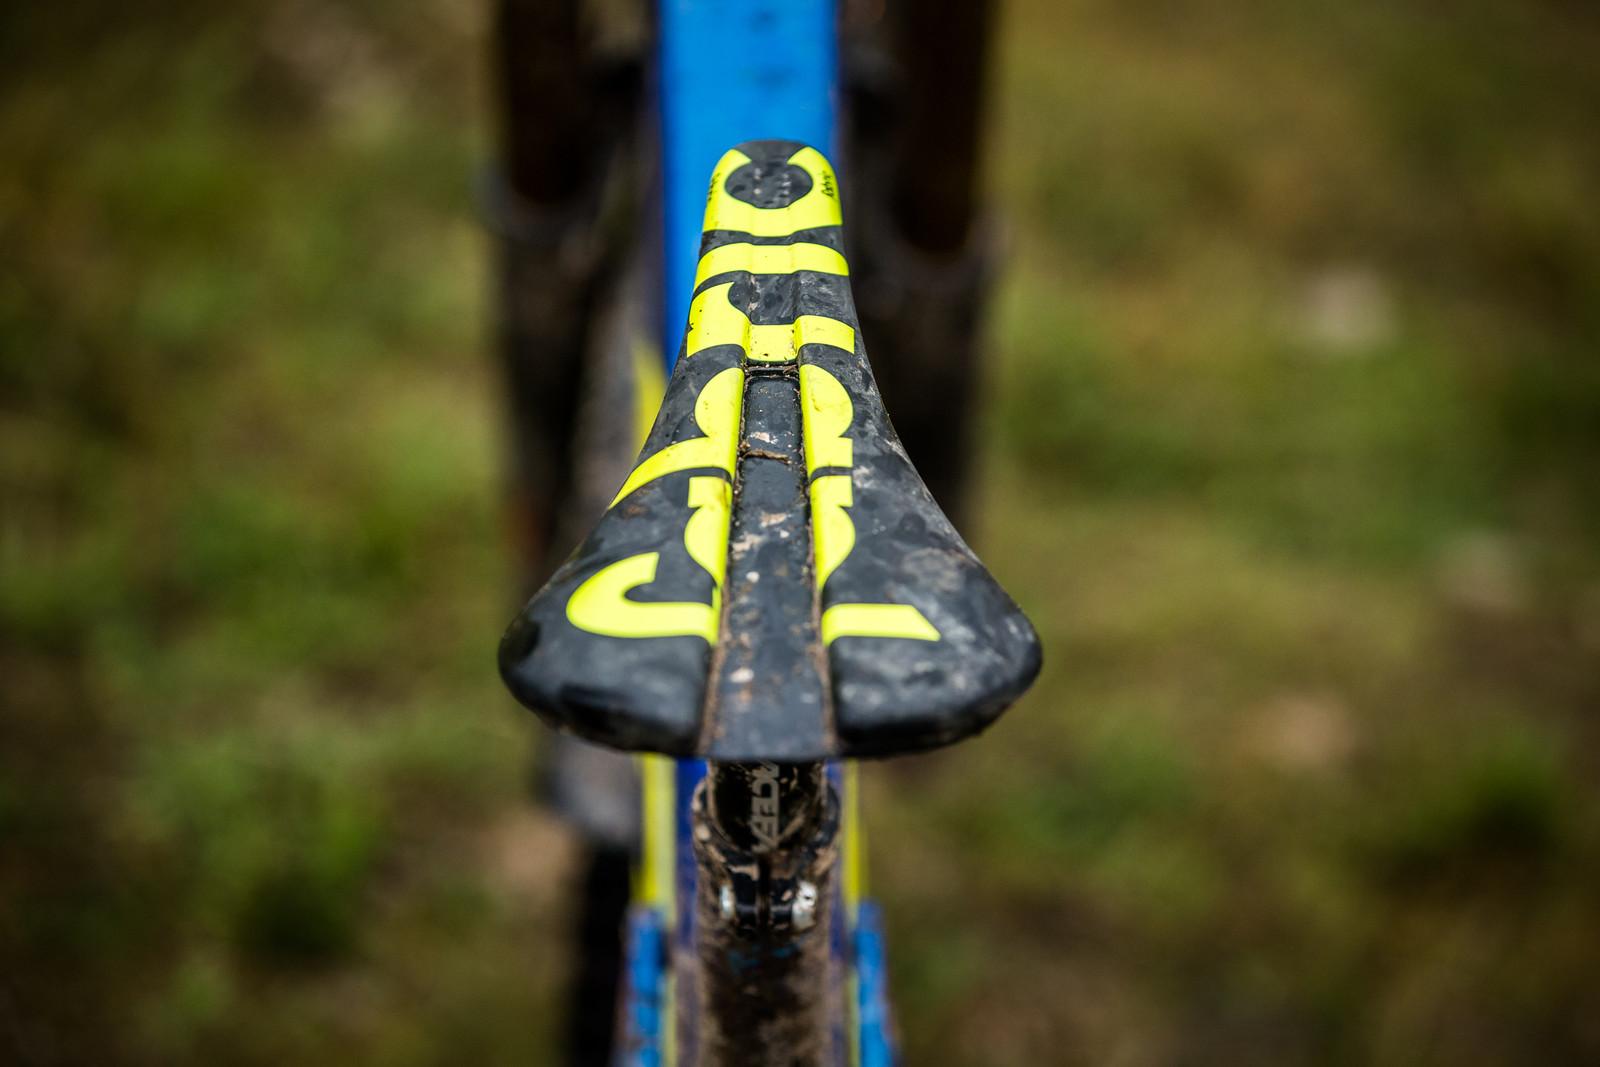 Fabric Saddle - WINNING BIKE - Martin Maes' GT Fury - Mountain Biking Pictures - Vital MTB